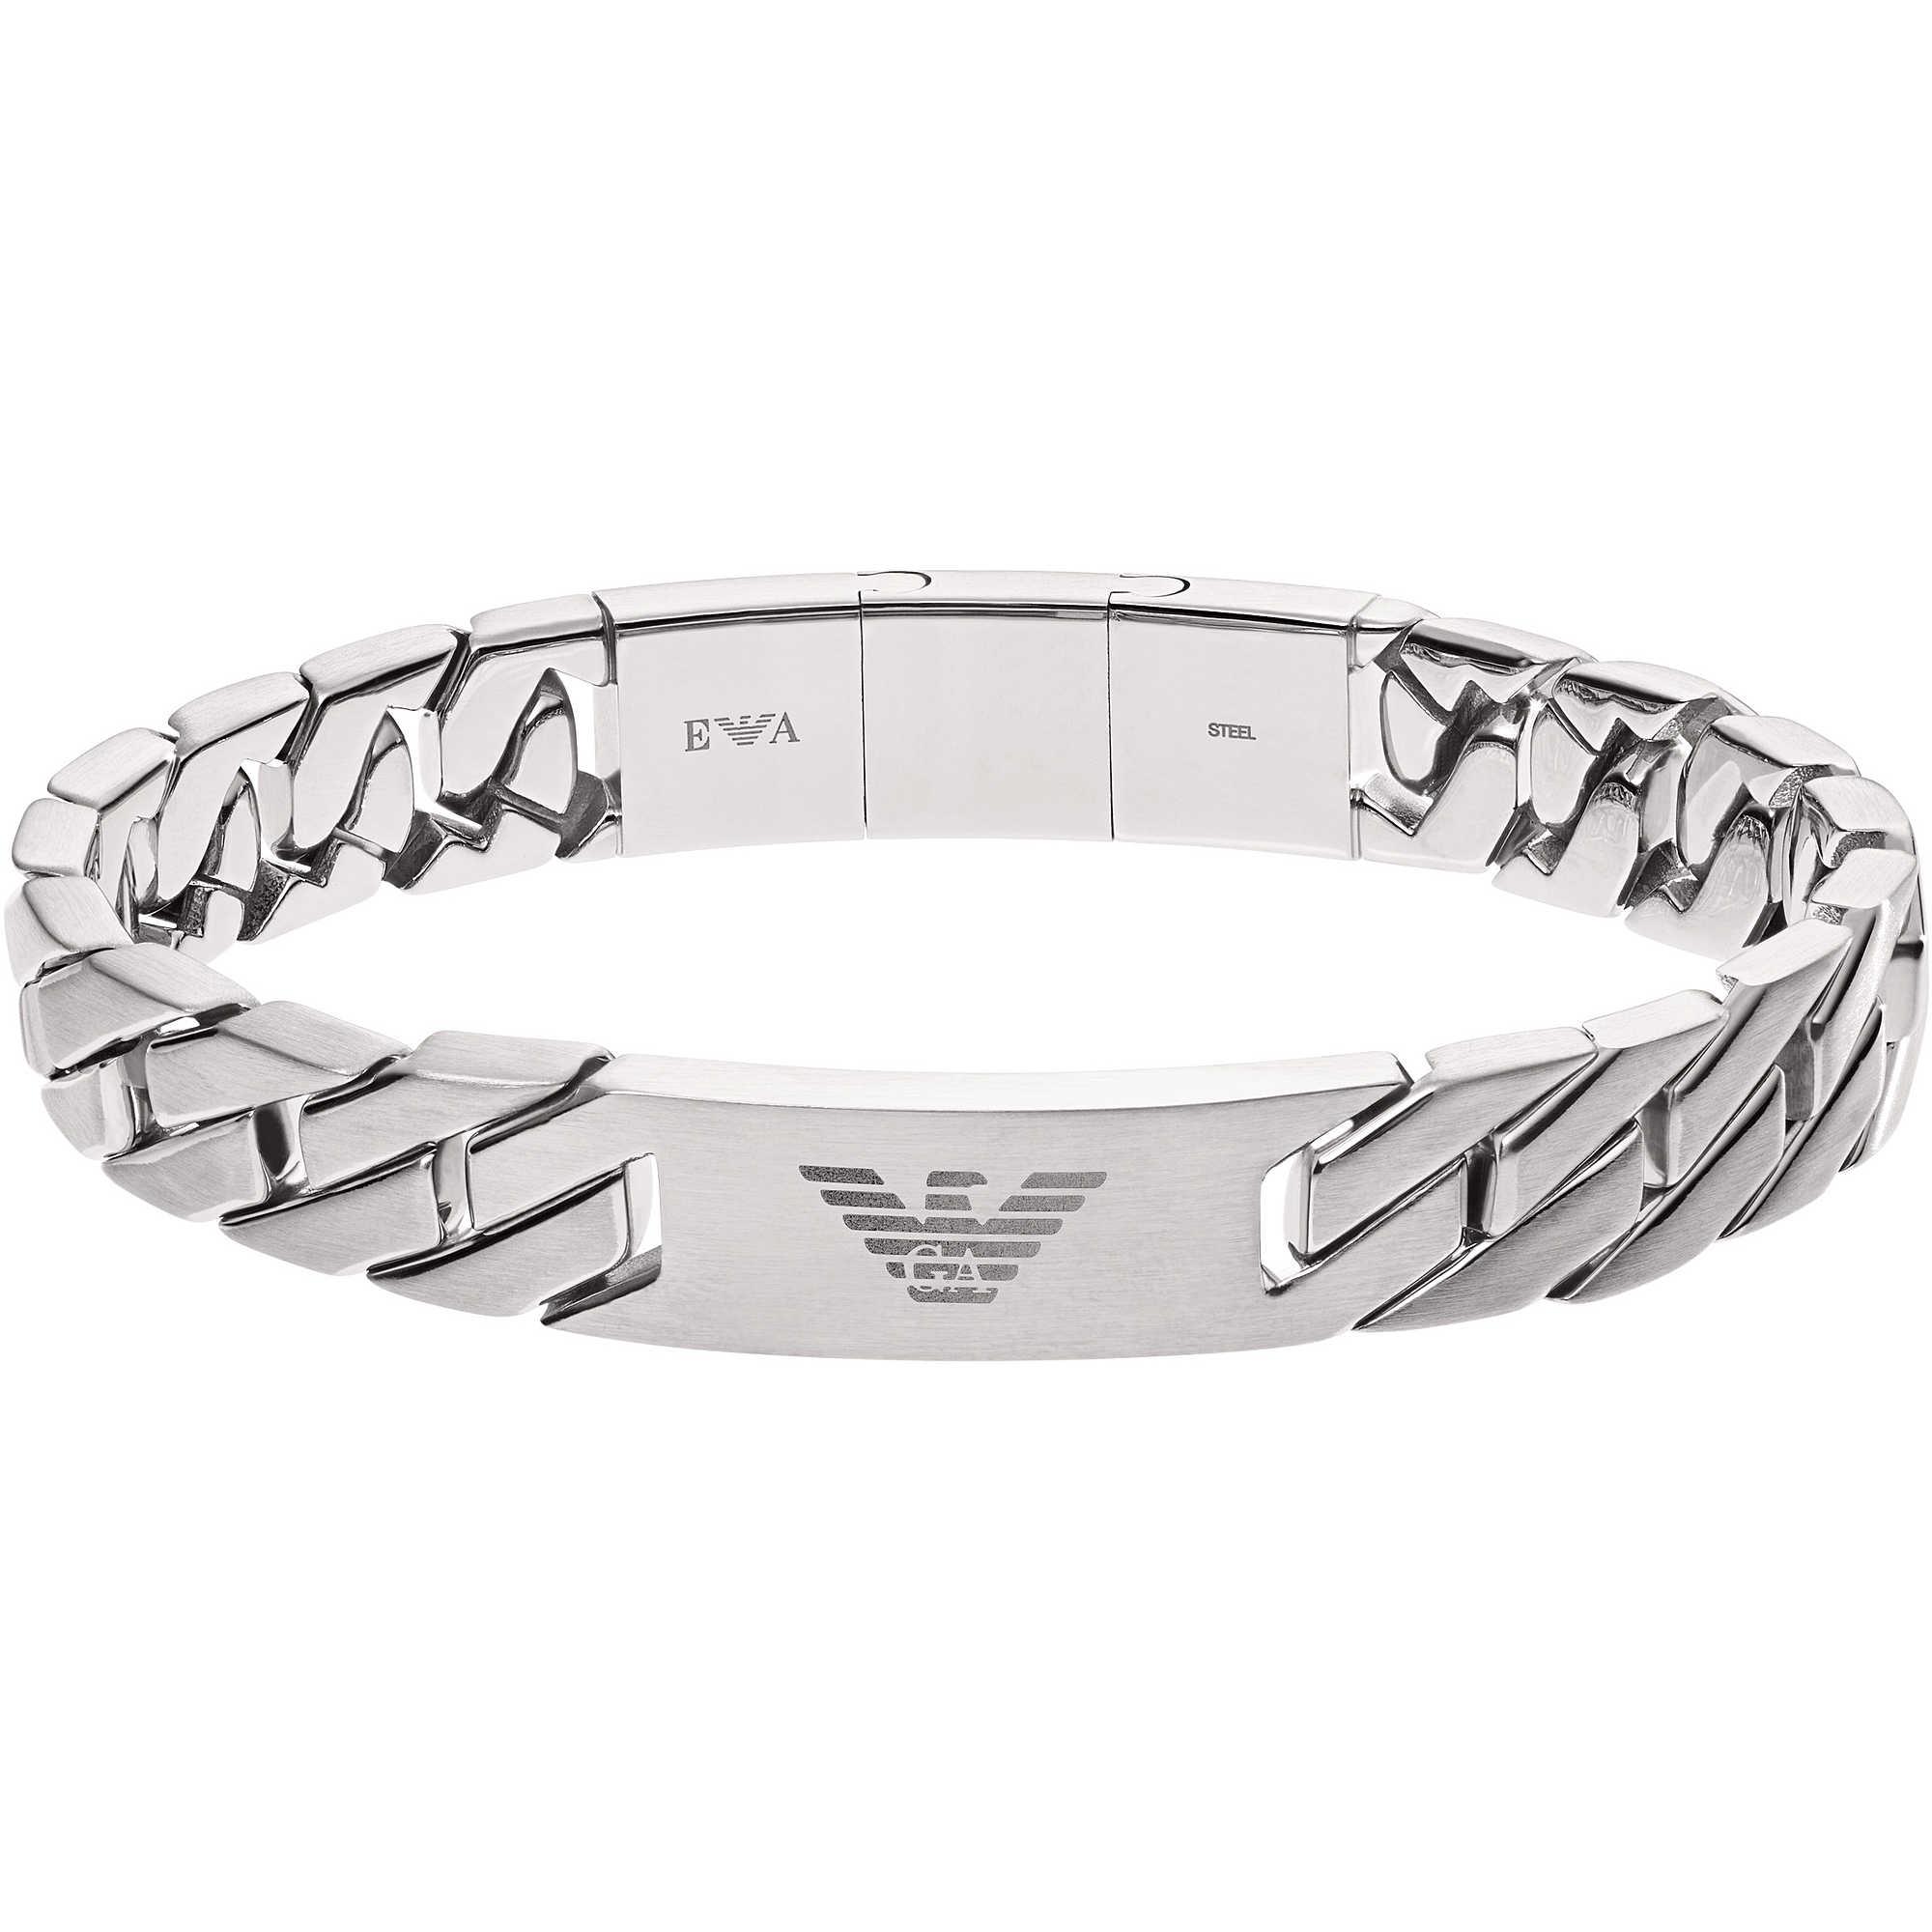 bracelet man jewellery Emporio Armani EGS2435040 bracelets Emporio ... f9bd2c4a46e